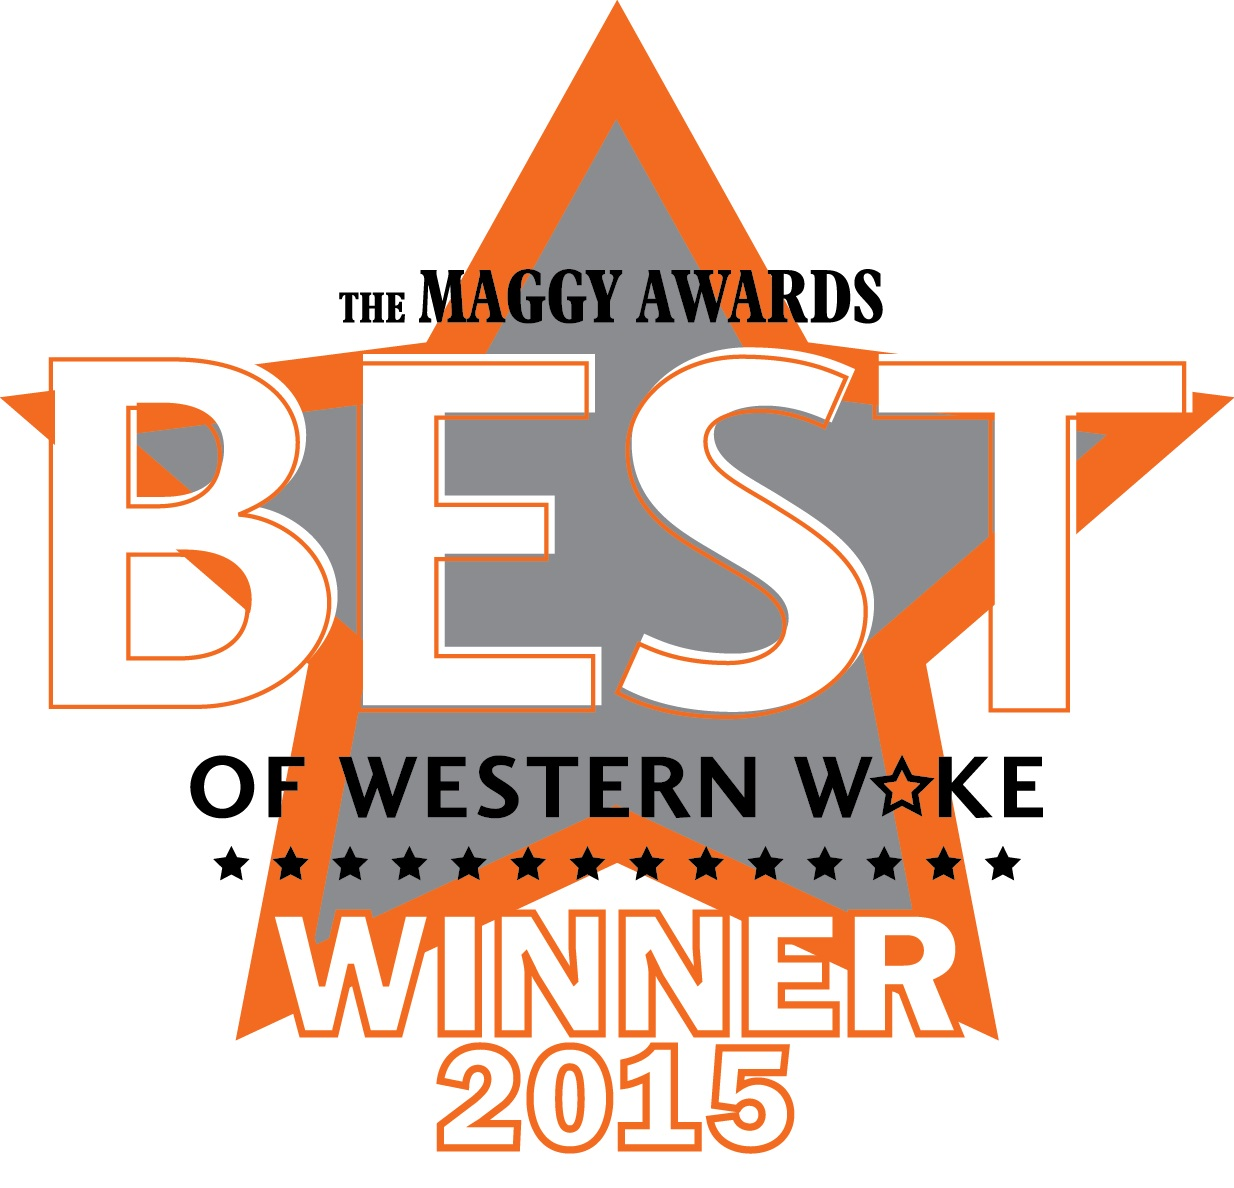 Cary Magazine Maggy Award Best in Western Wake Best Wine Shop Triangle Wine Company 2015